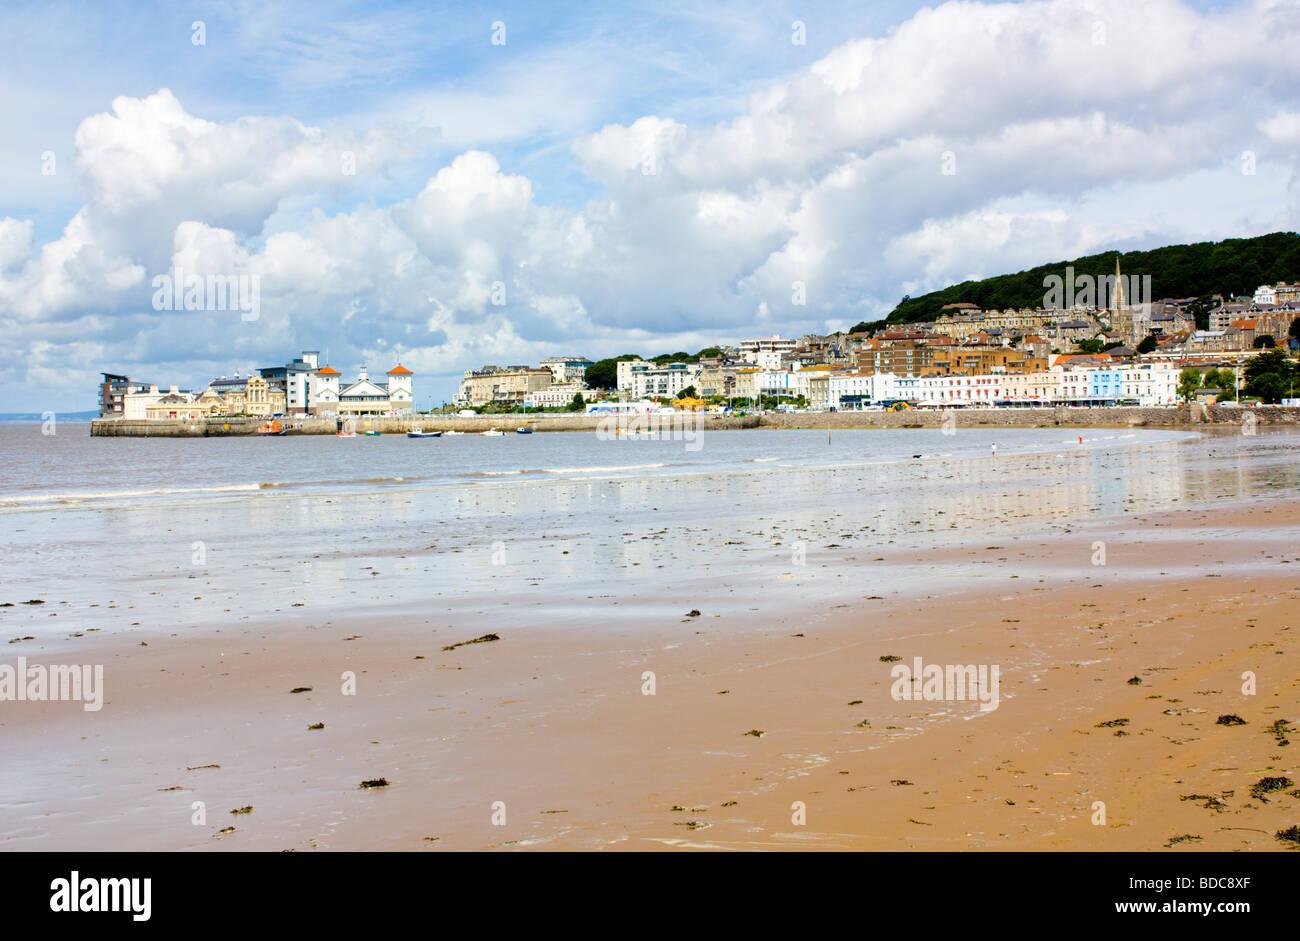 The beach at Weston super Mare Somerset England UK - Stock Image